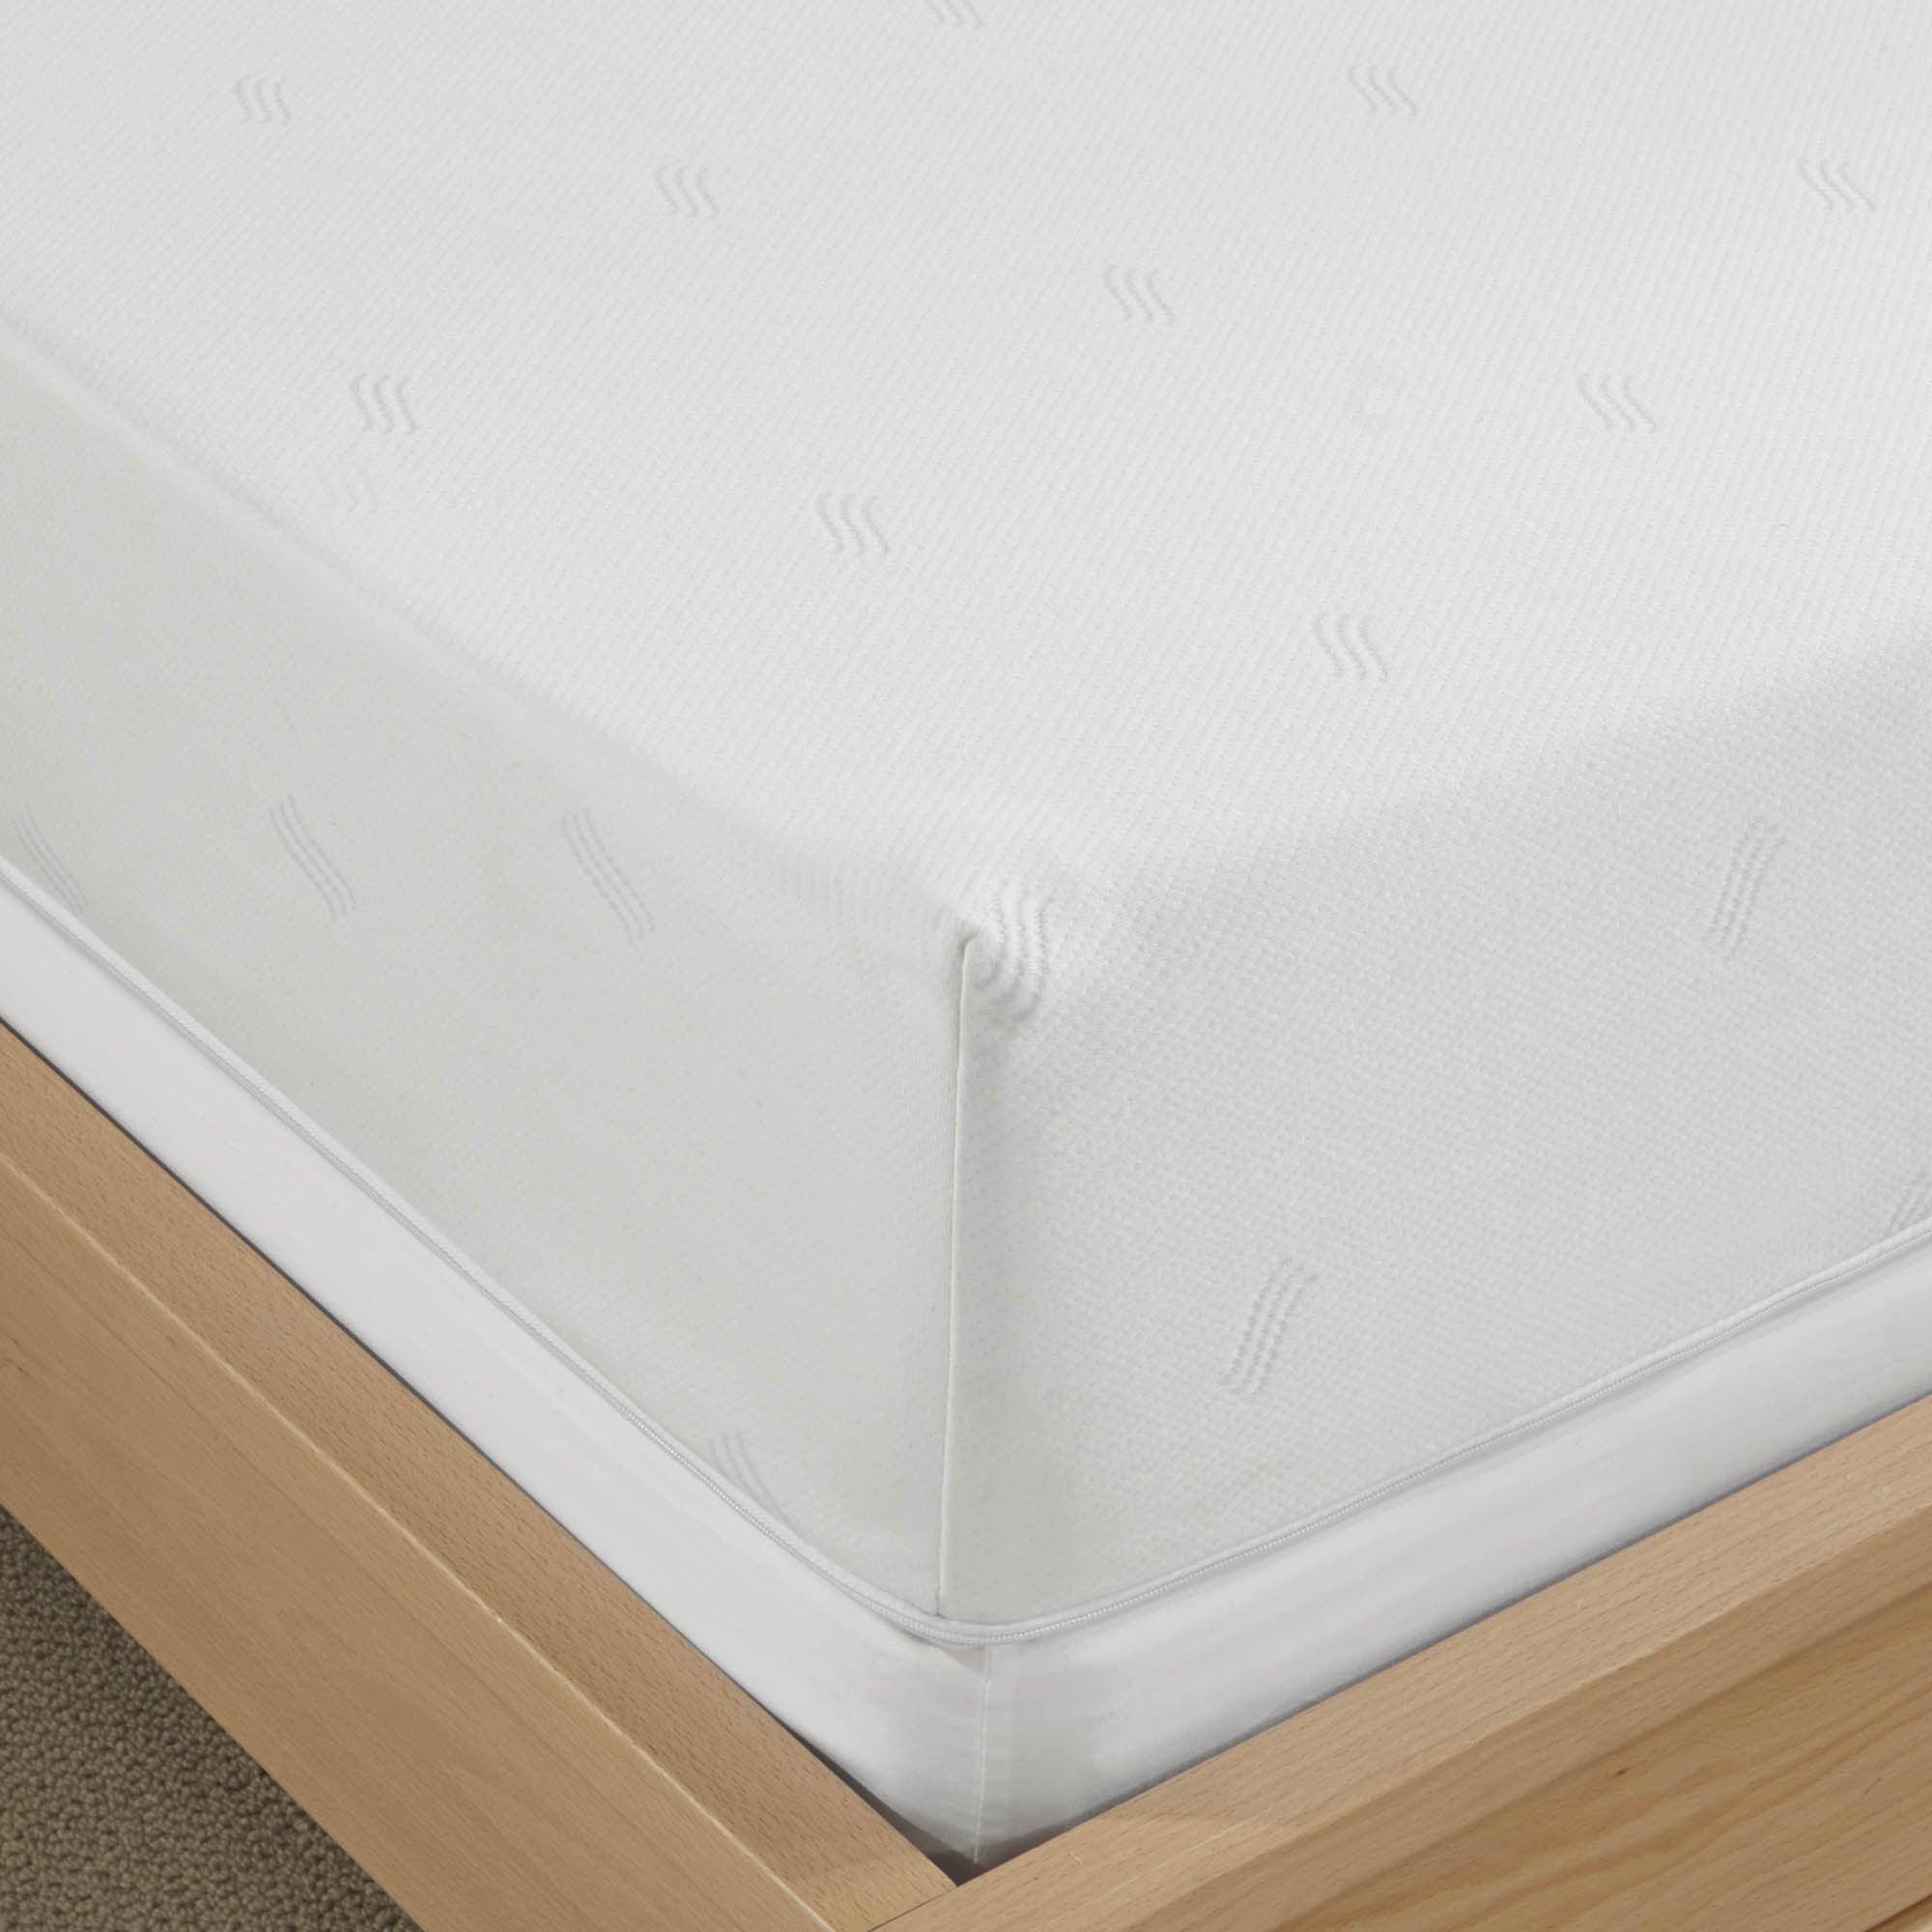 Shop Serta Cotton Foam 8 Inch Twin Size Memory Foam Mattress Free